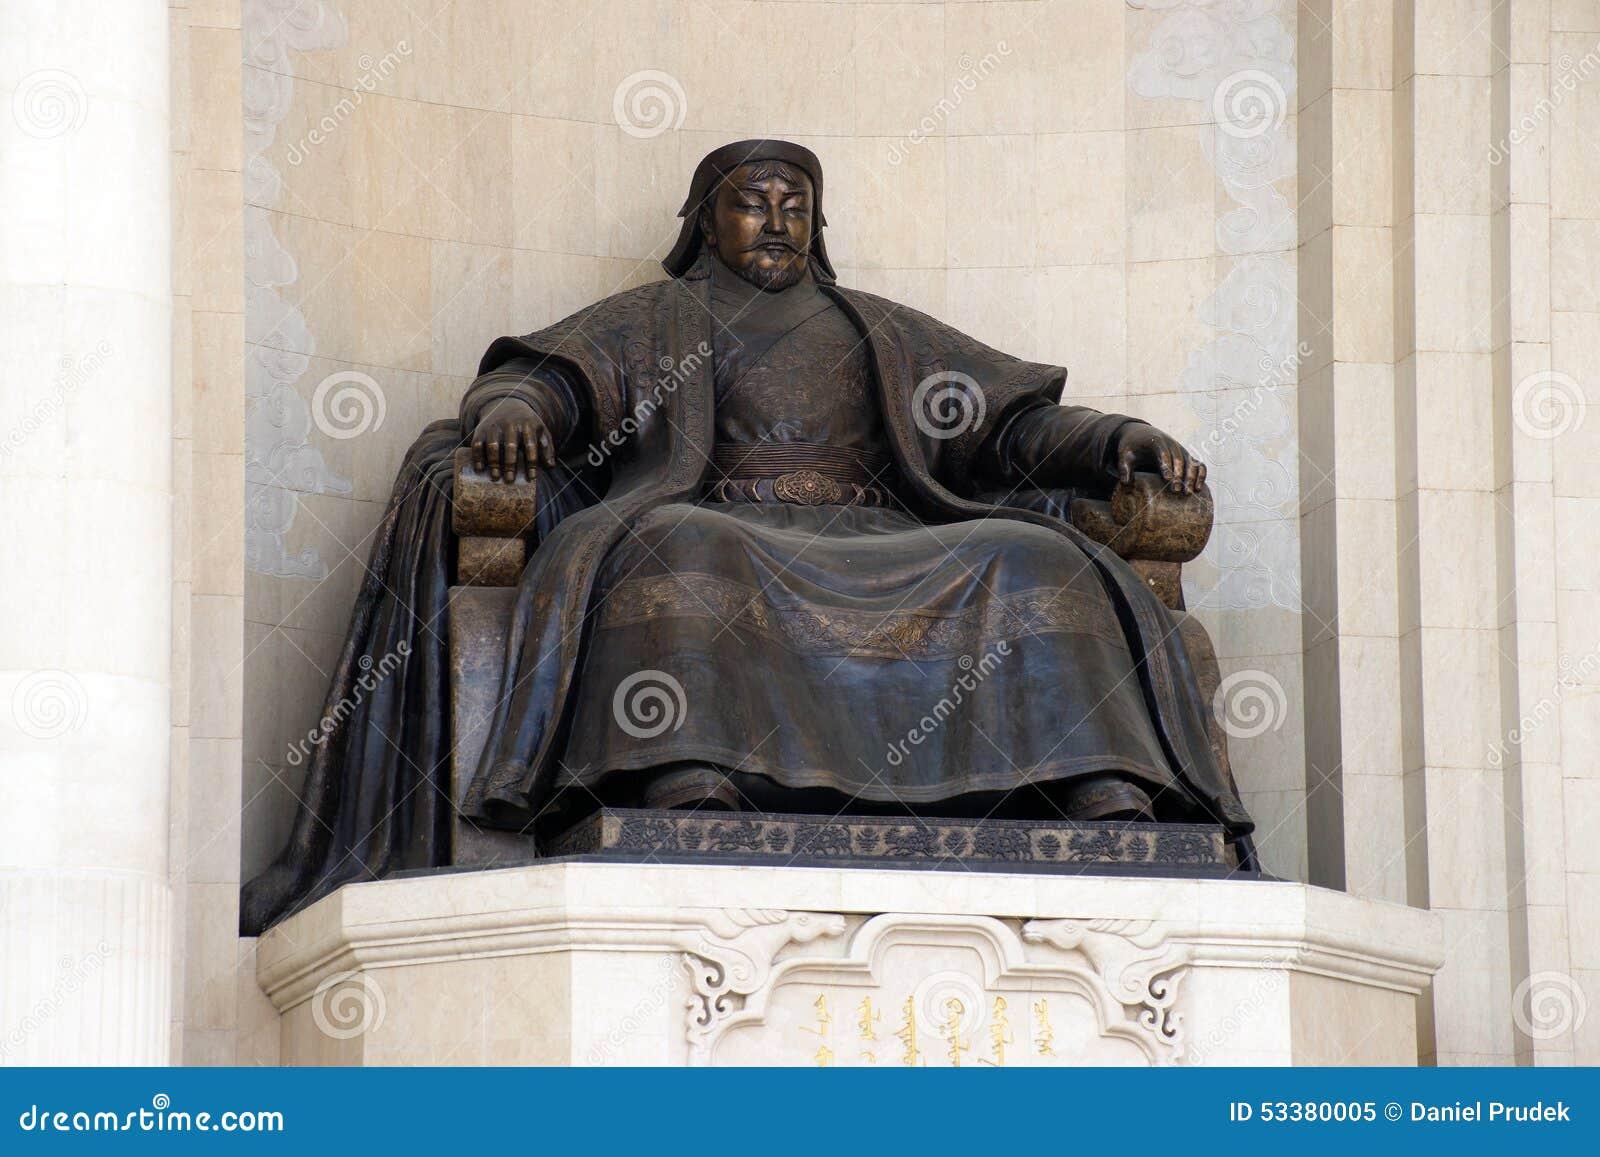 Statue En Bronze Du Grand Empereur Genghis Khan Image éditorial